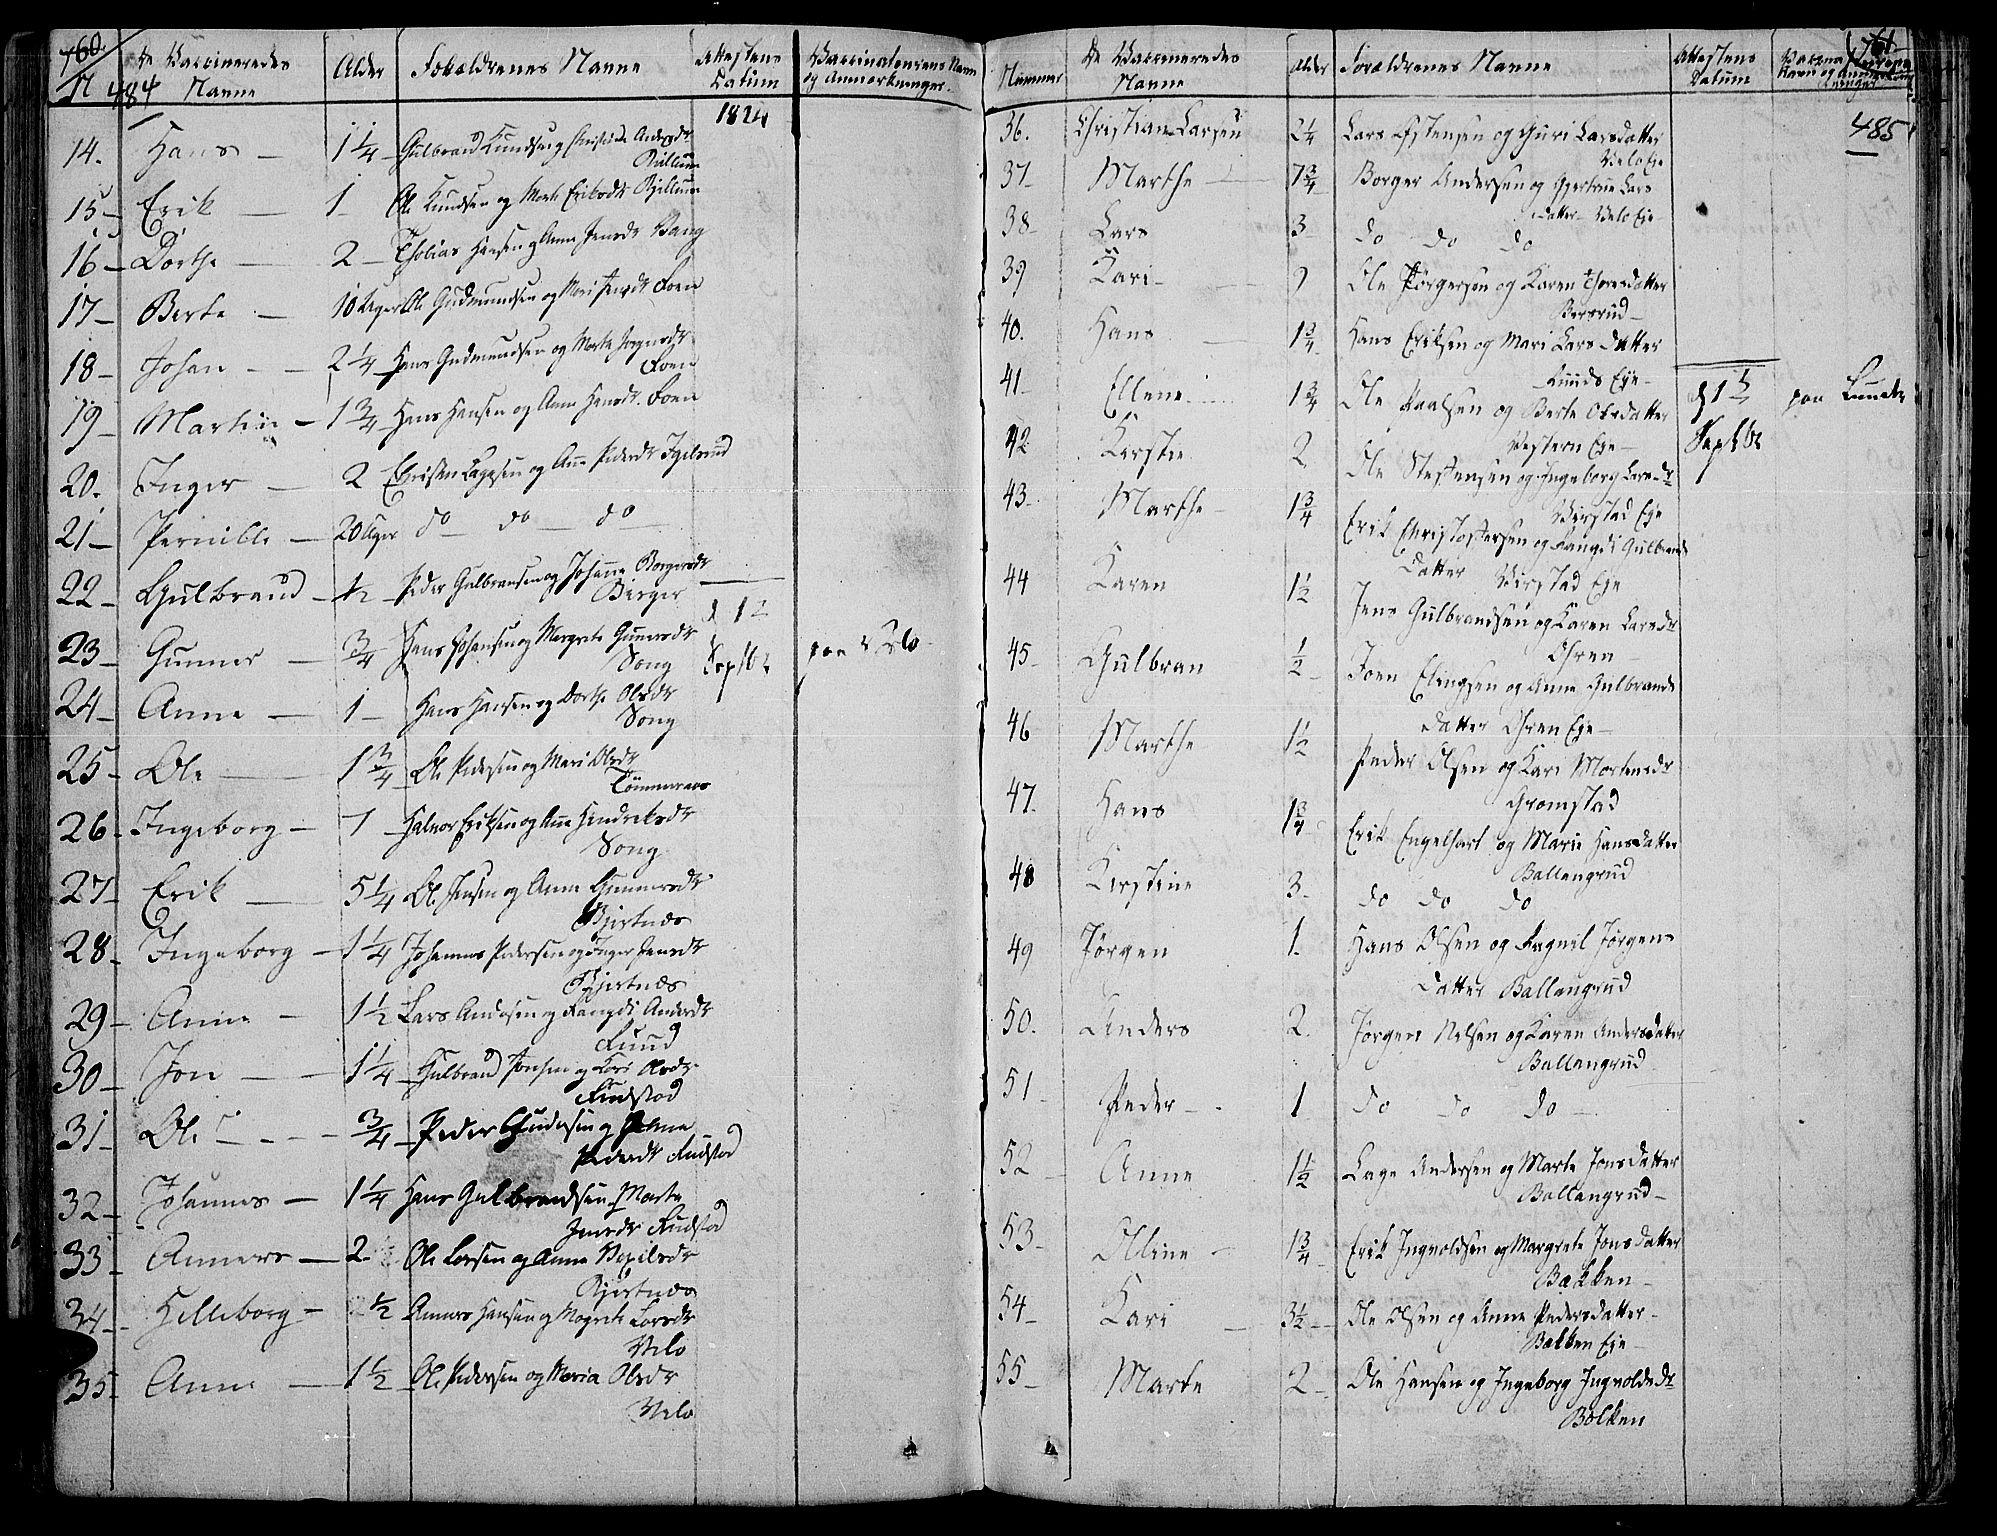 SAH, Jevnaker prestekontor, Ministerialbok nr. 4, 1800-1861, s. 484-485